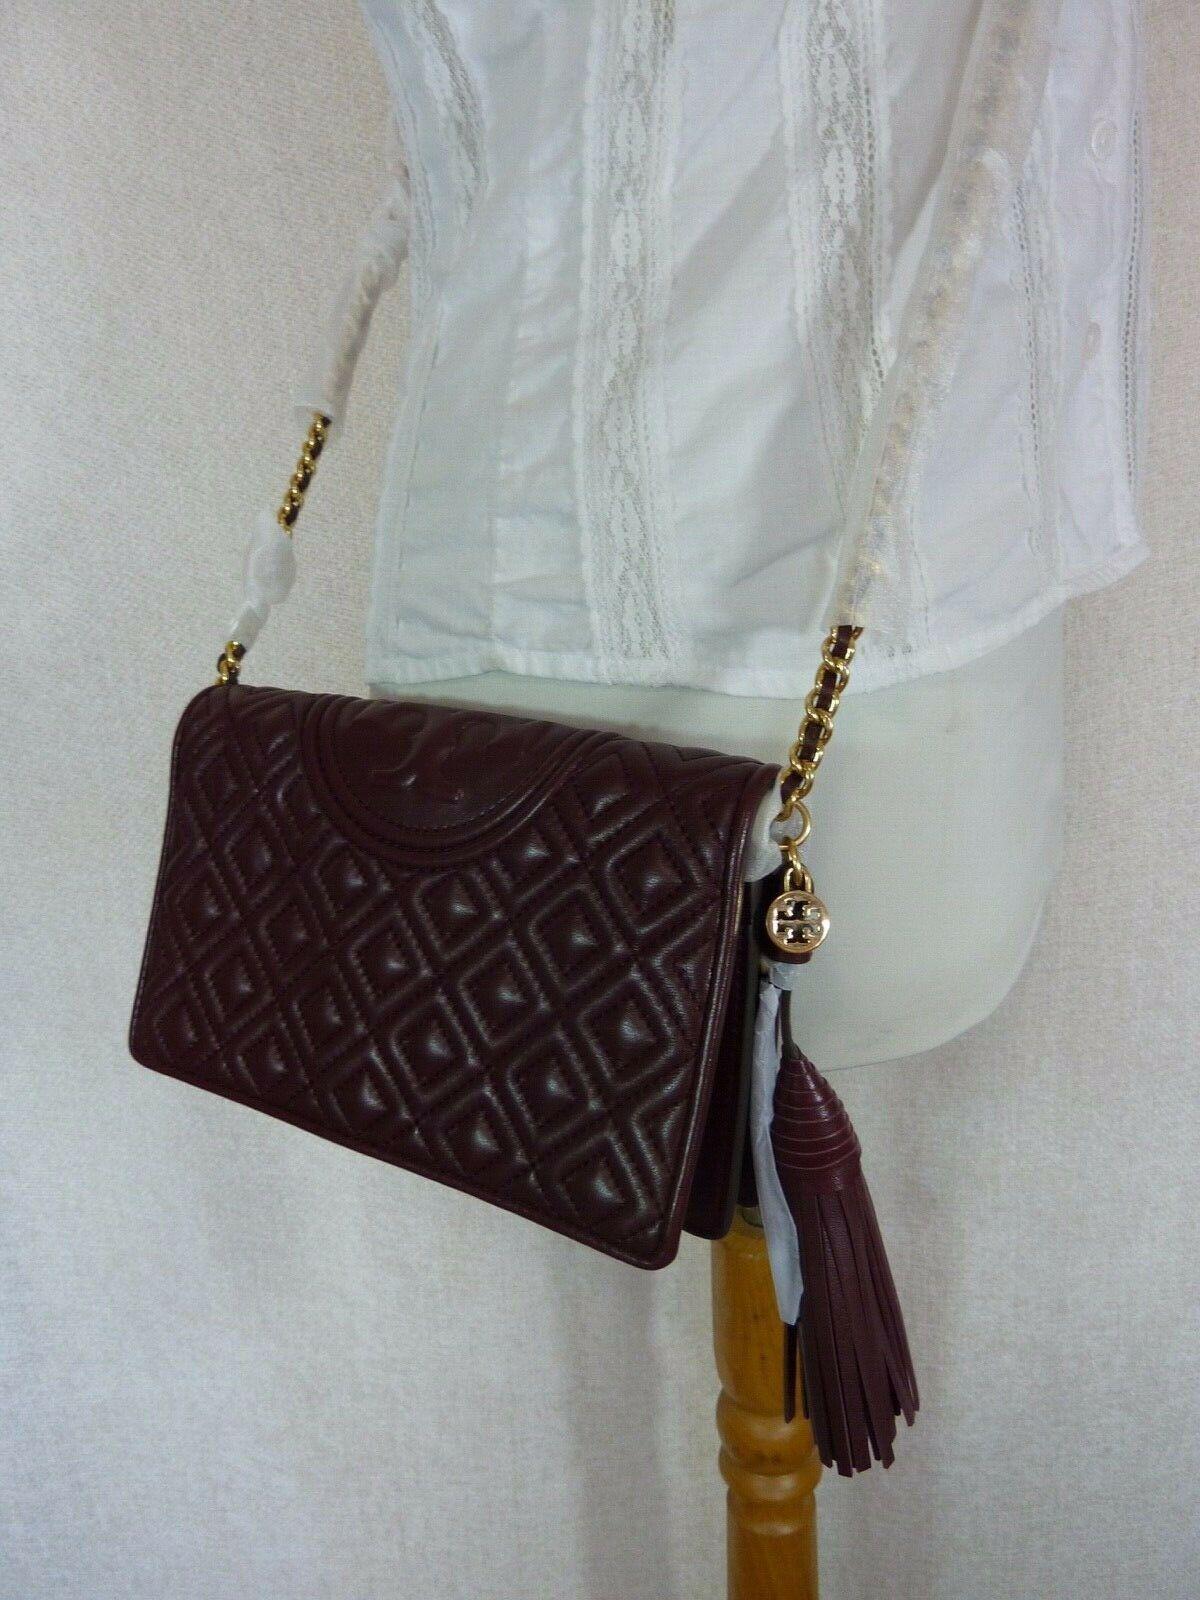 NWT Tory Burch Claret Fleming Wallet Cross Body Bag $328 image 11